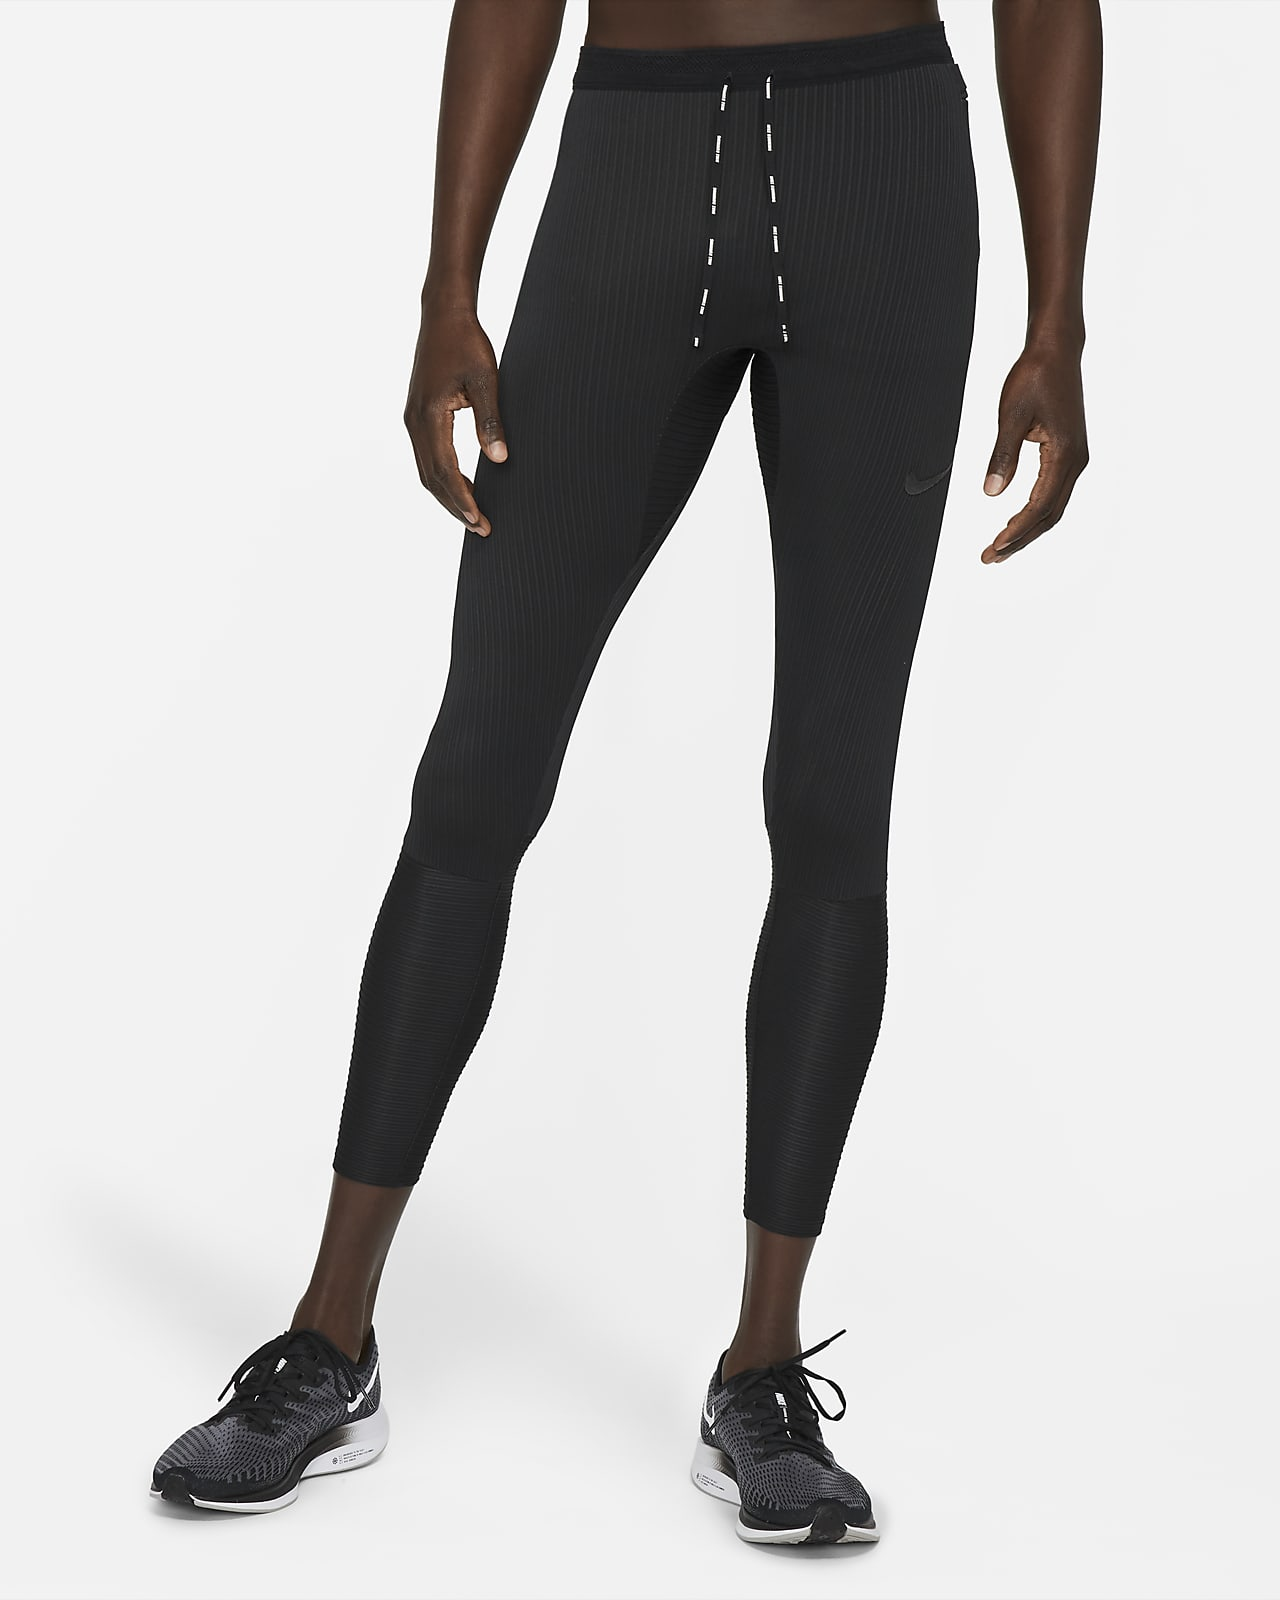 Legging de running Nike Dri-FIT Swift pour Homme